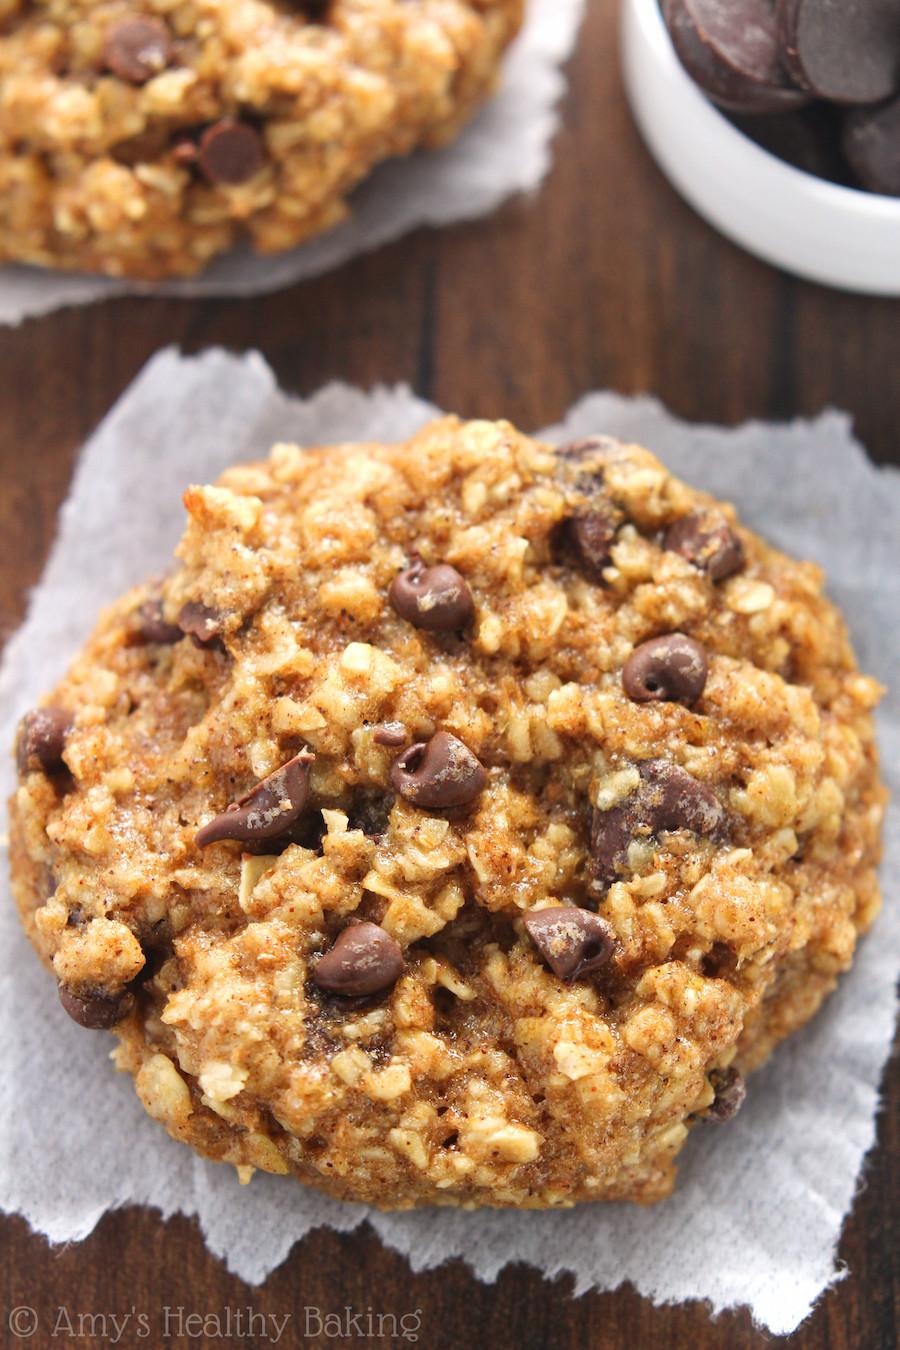 Healthy Homemade Oatmeal Cookies  Chocolate Chip Banana Bread Oatmeal Cookies